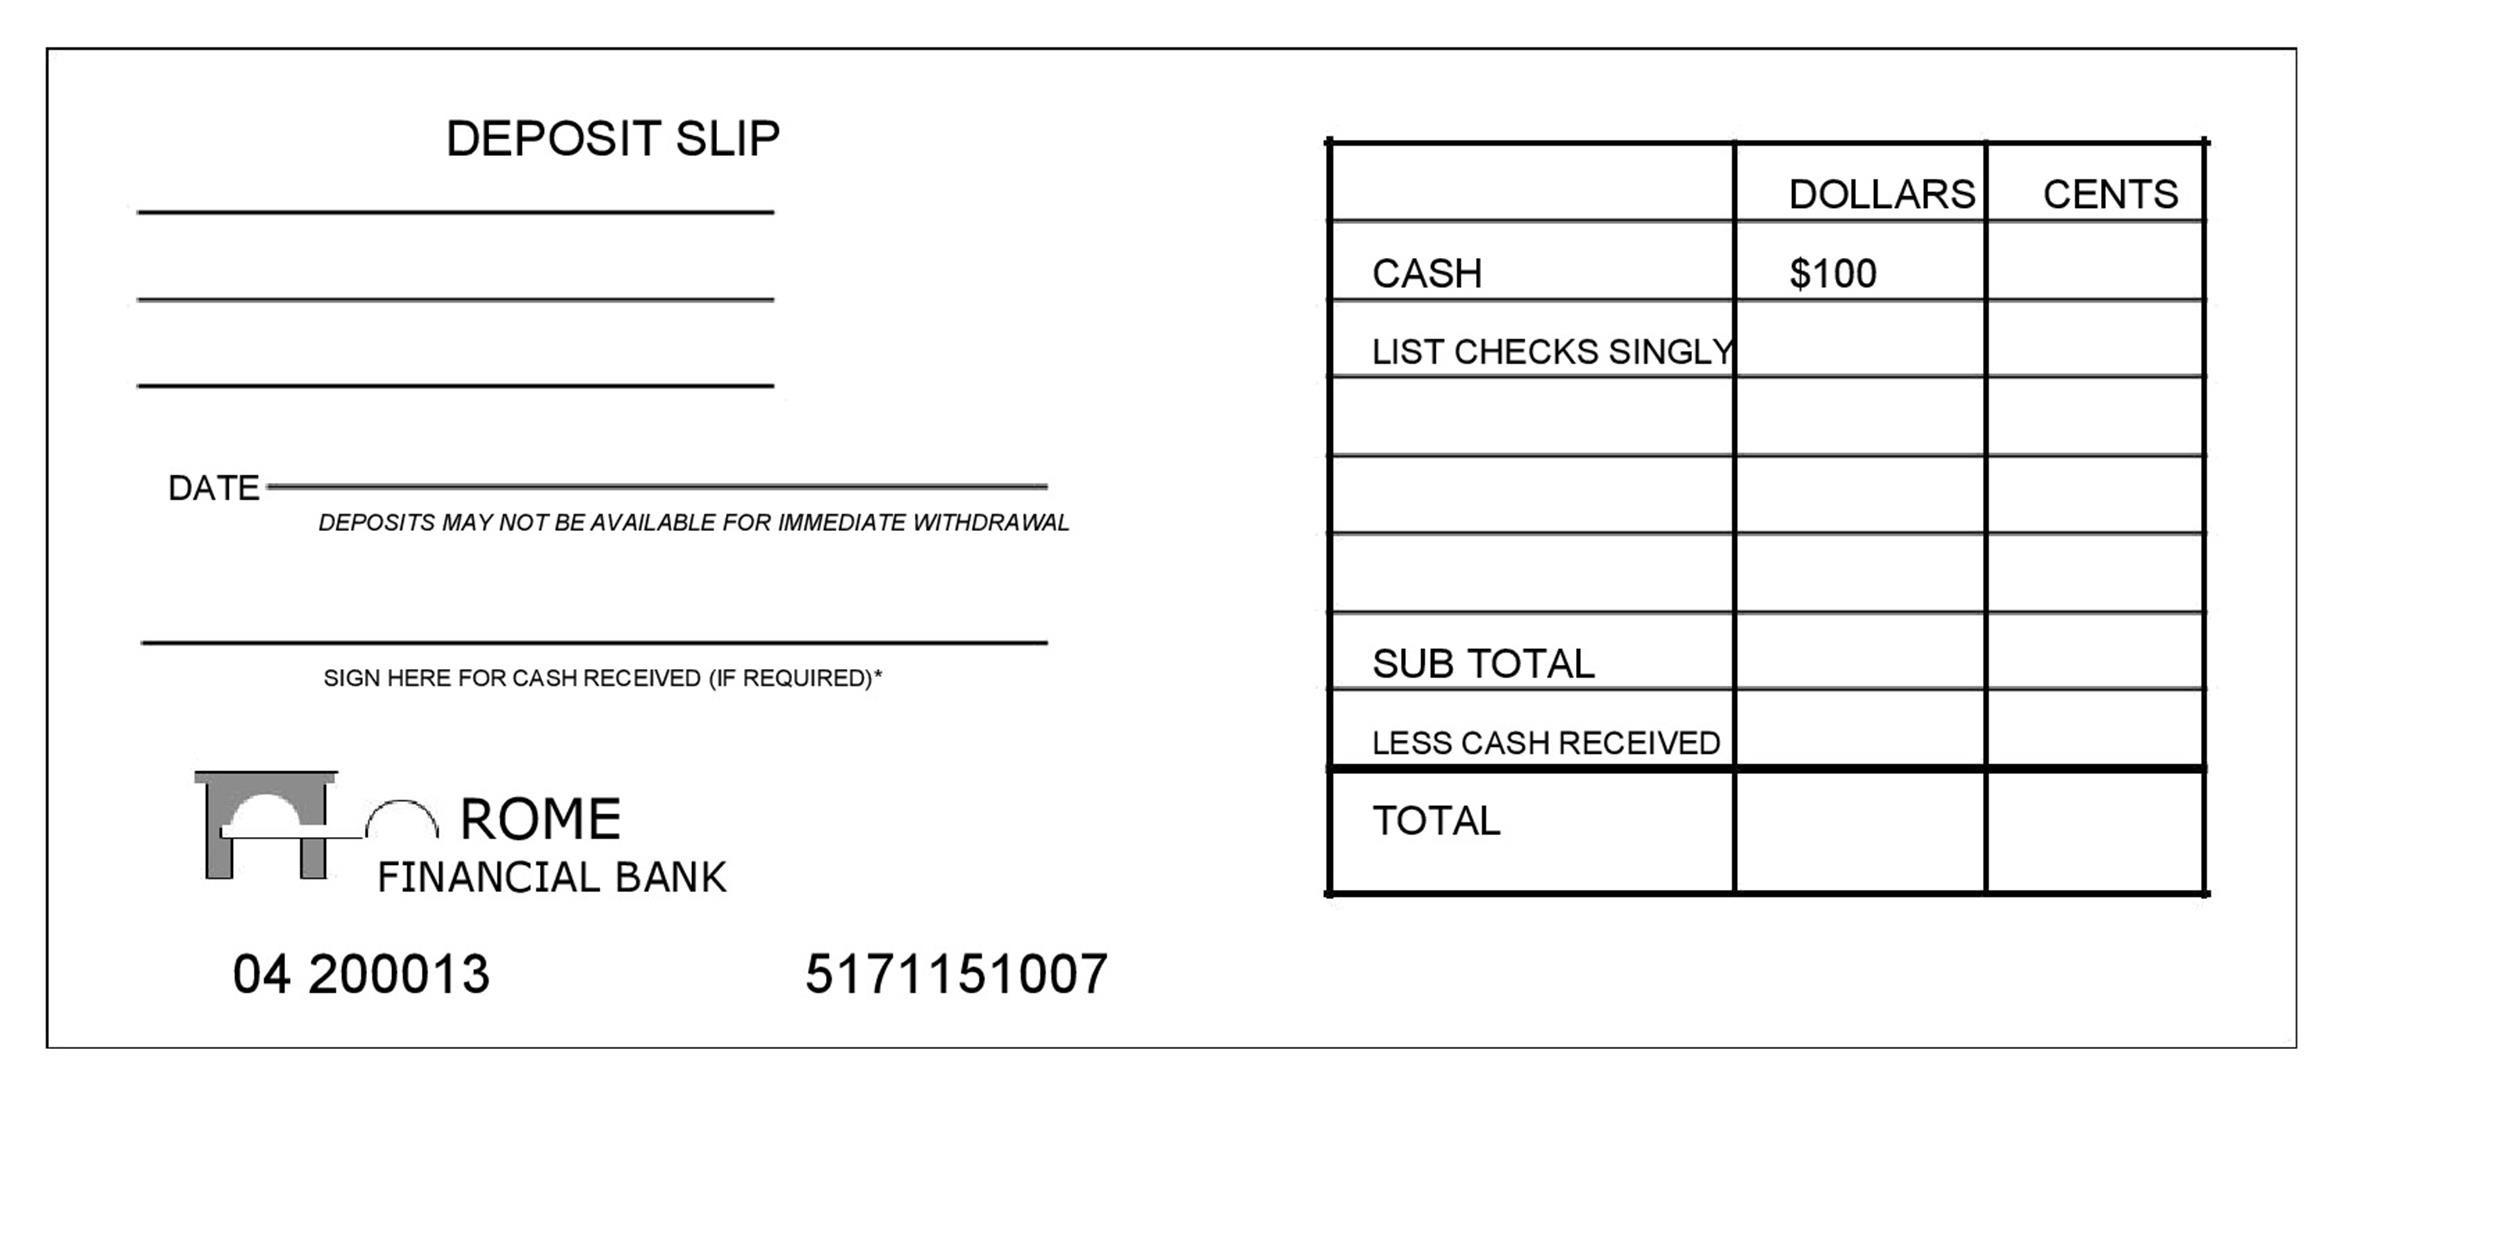 37 bank deposit slip templates examples template lab. Black Bedroom Furniture Sets. Home Design Ideas